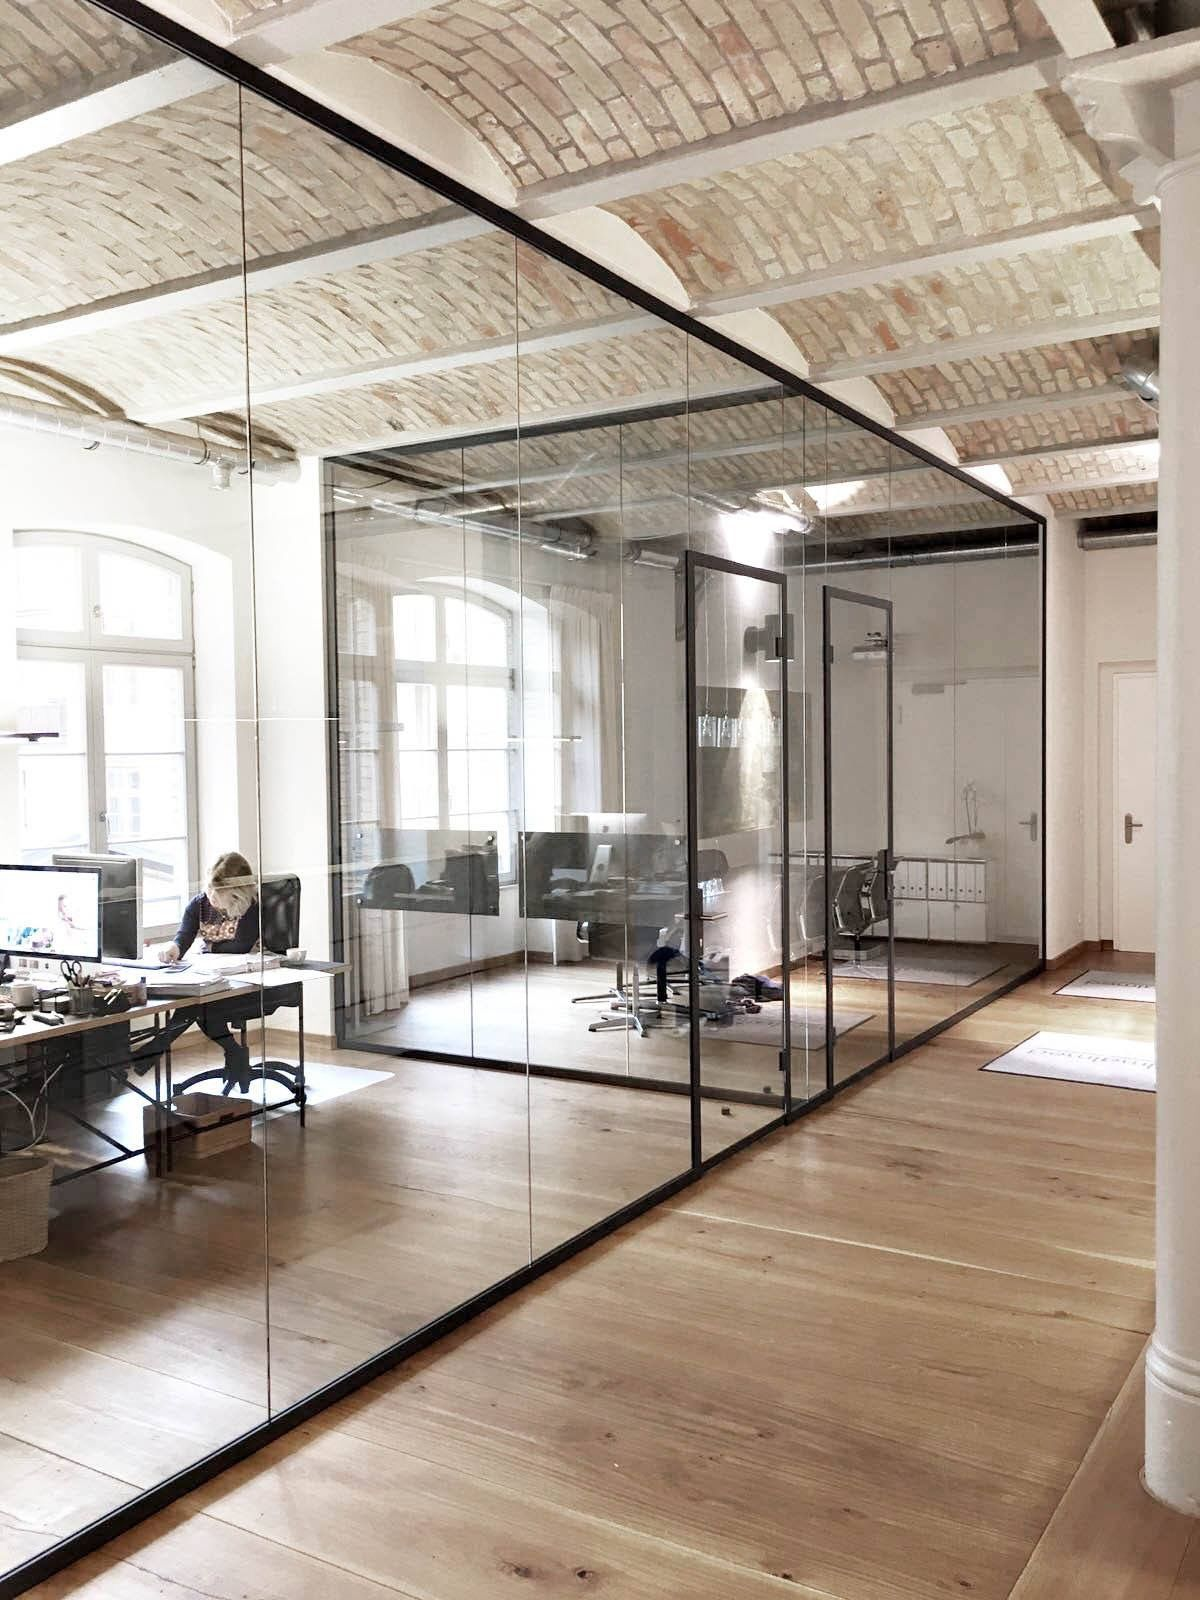 open space office design ideas. Office In Use- Neat Boxes On Floor, Bin, Desk Items. Open Space Design Ideas E